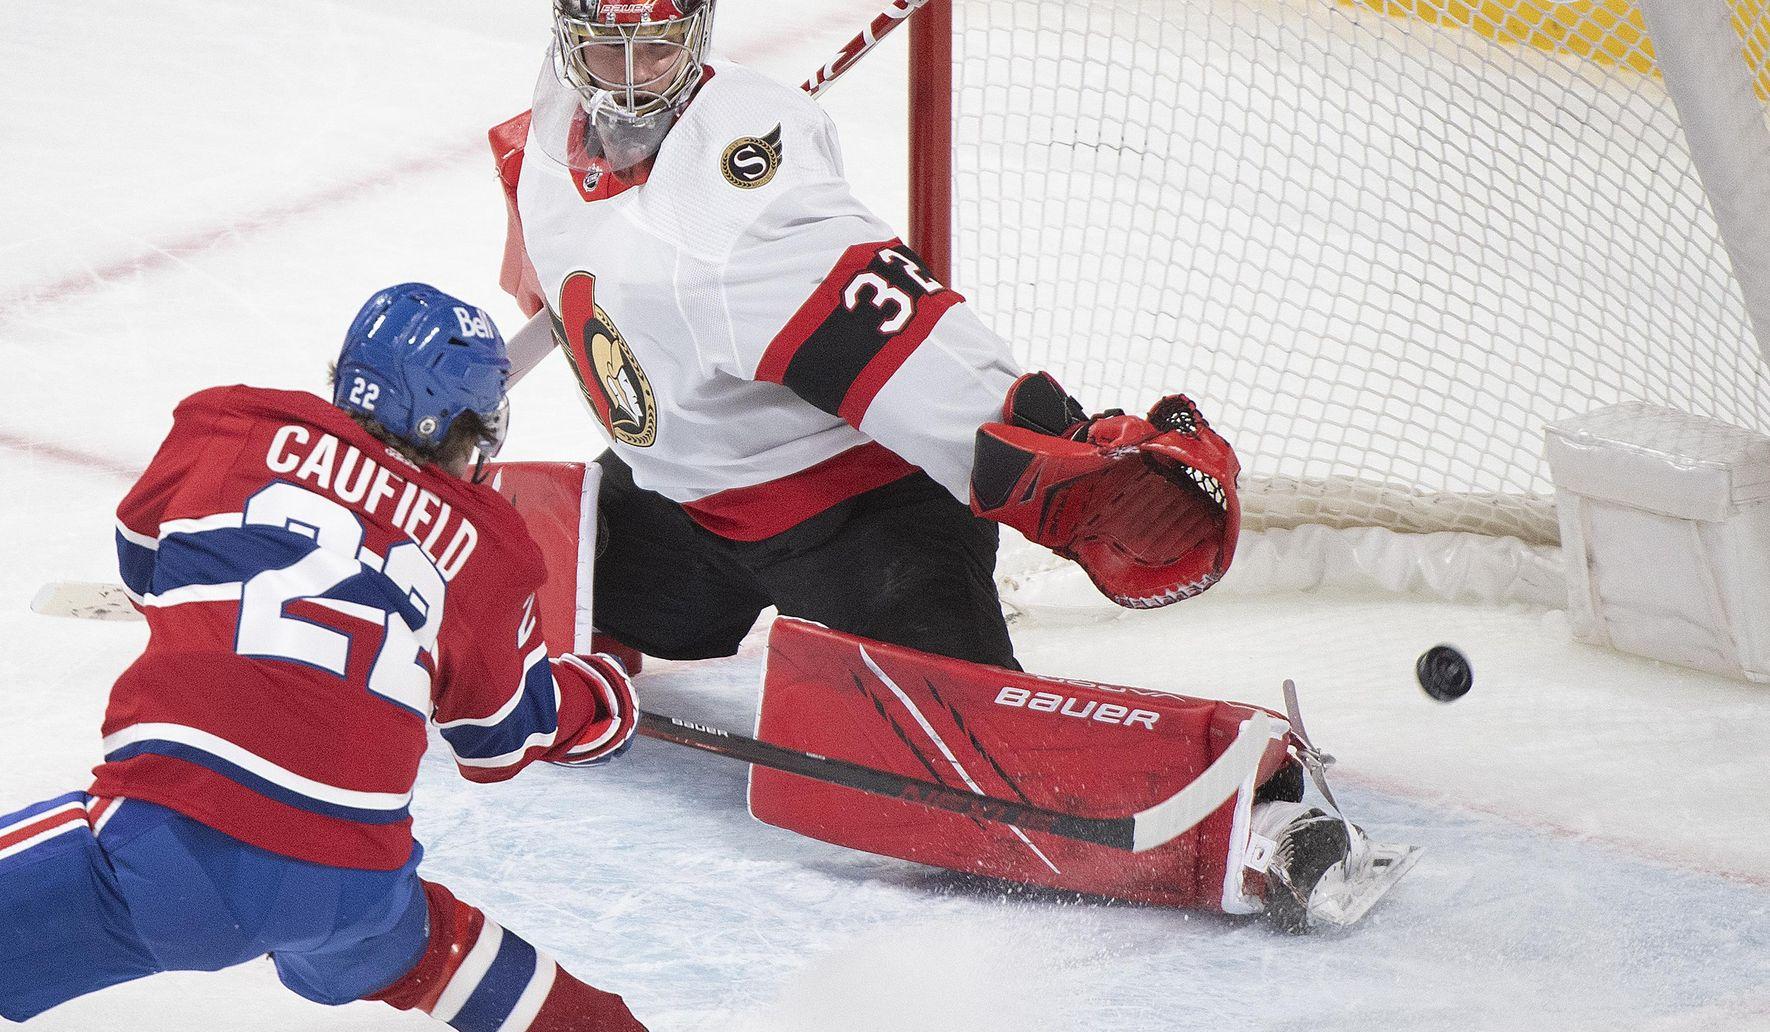 Senators_canadiens_hockey_74905_c0-247-3000-1996_s1770x1032